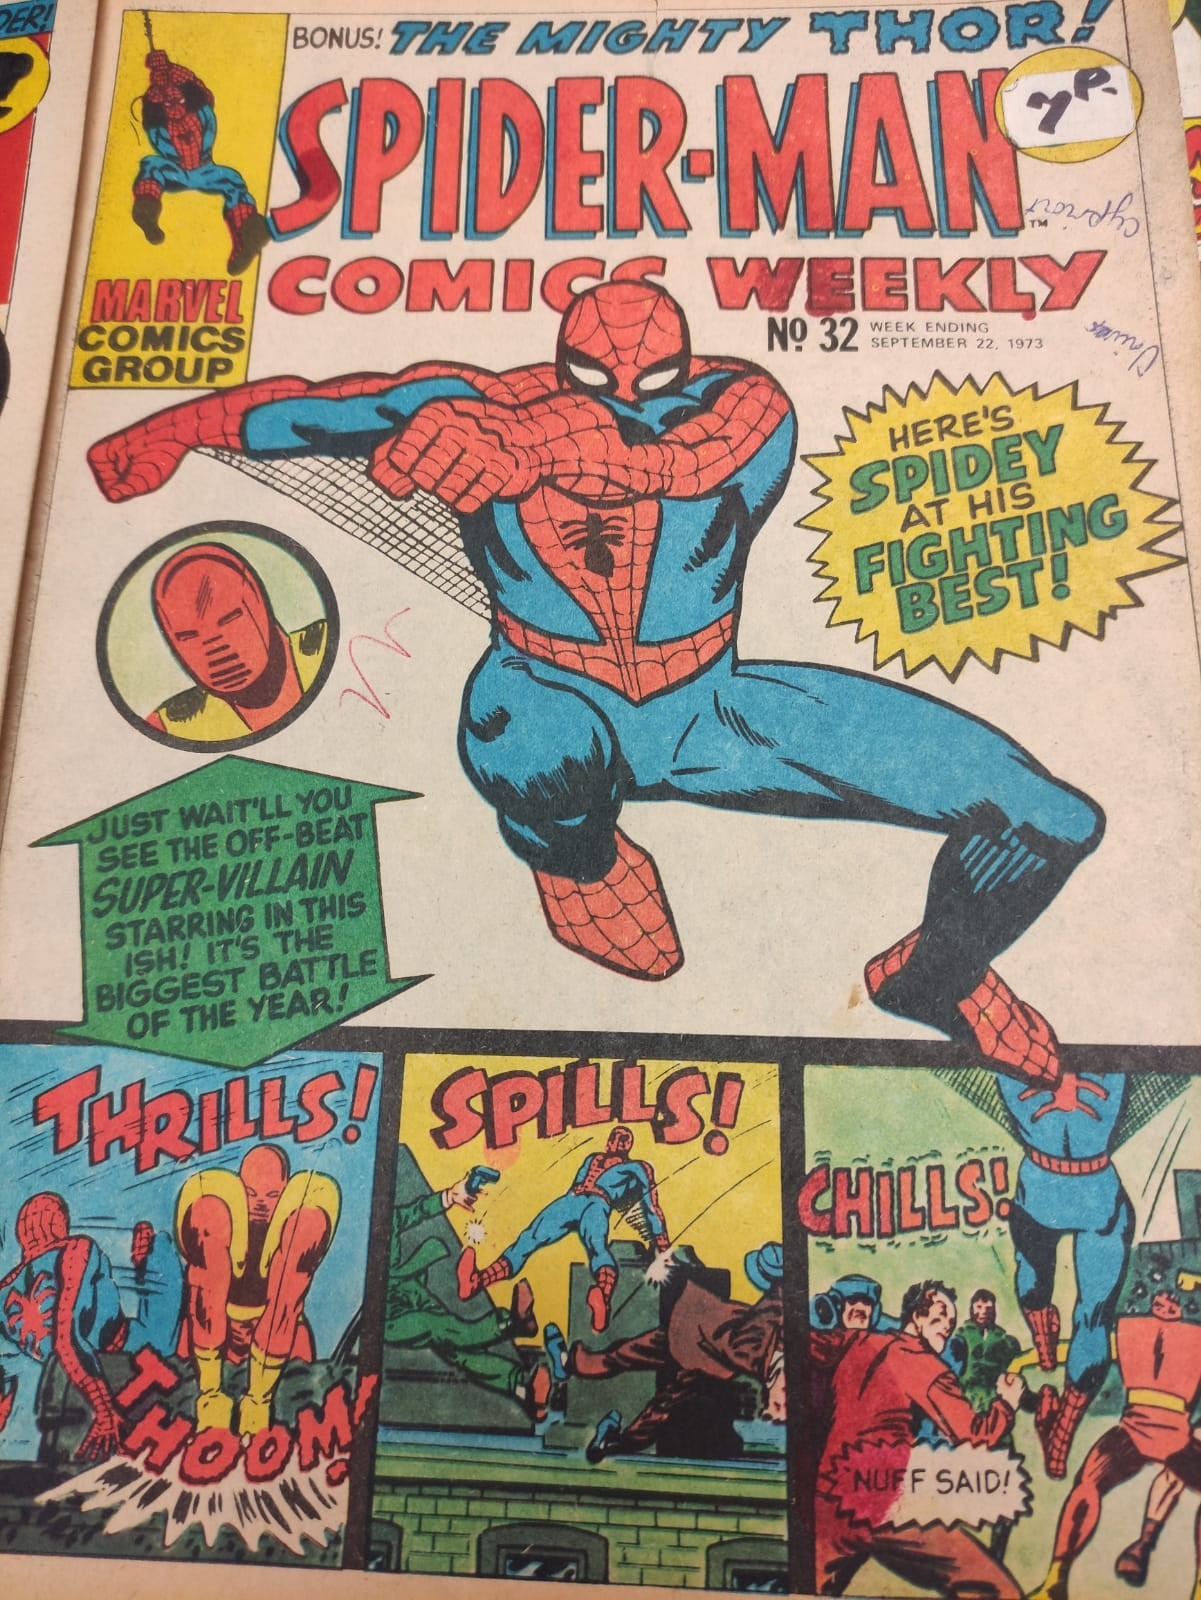 6 x Marvel comics. 1973 Spider-Man comics weekly. - Image 11 of 13